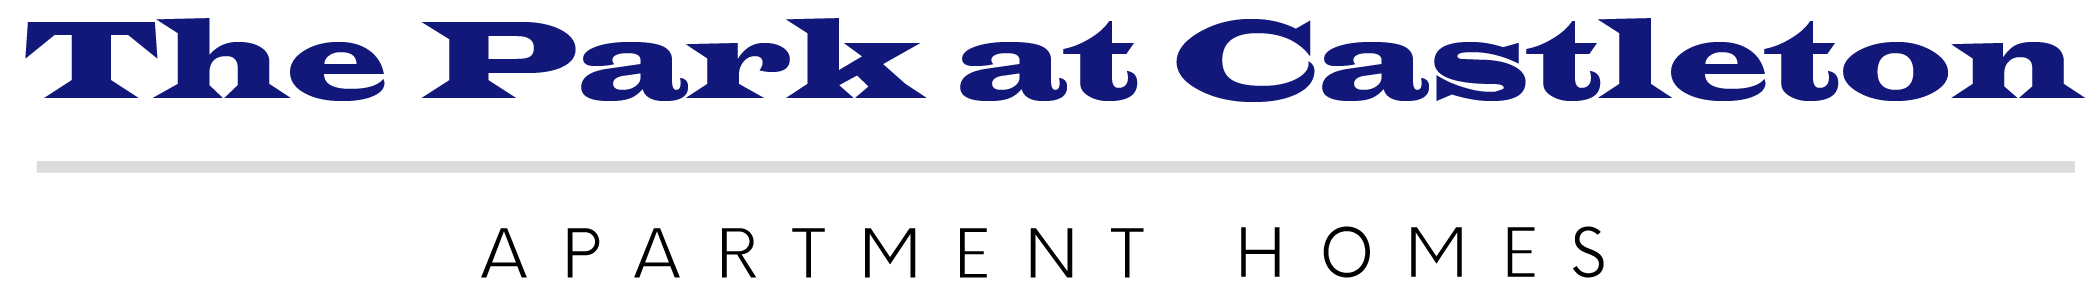 The Park at Castleton Logo